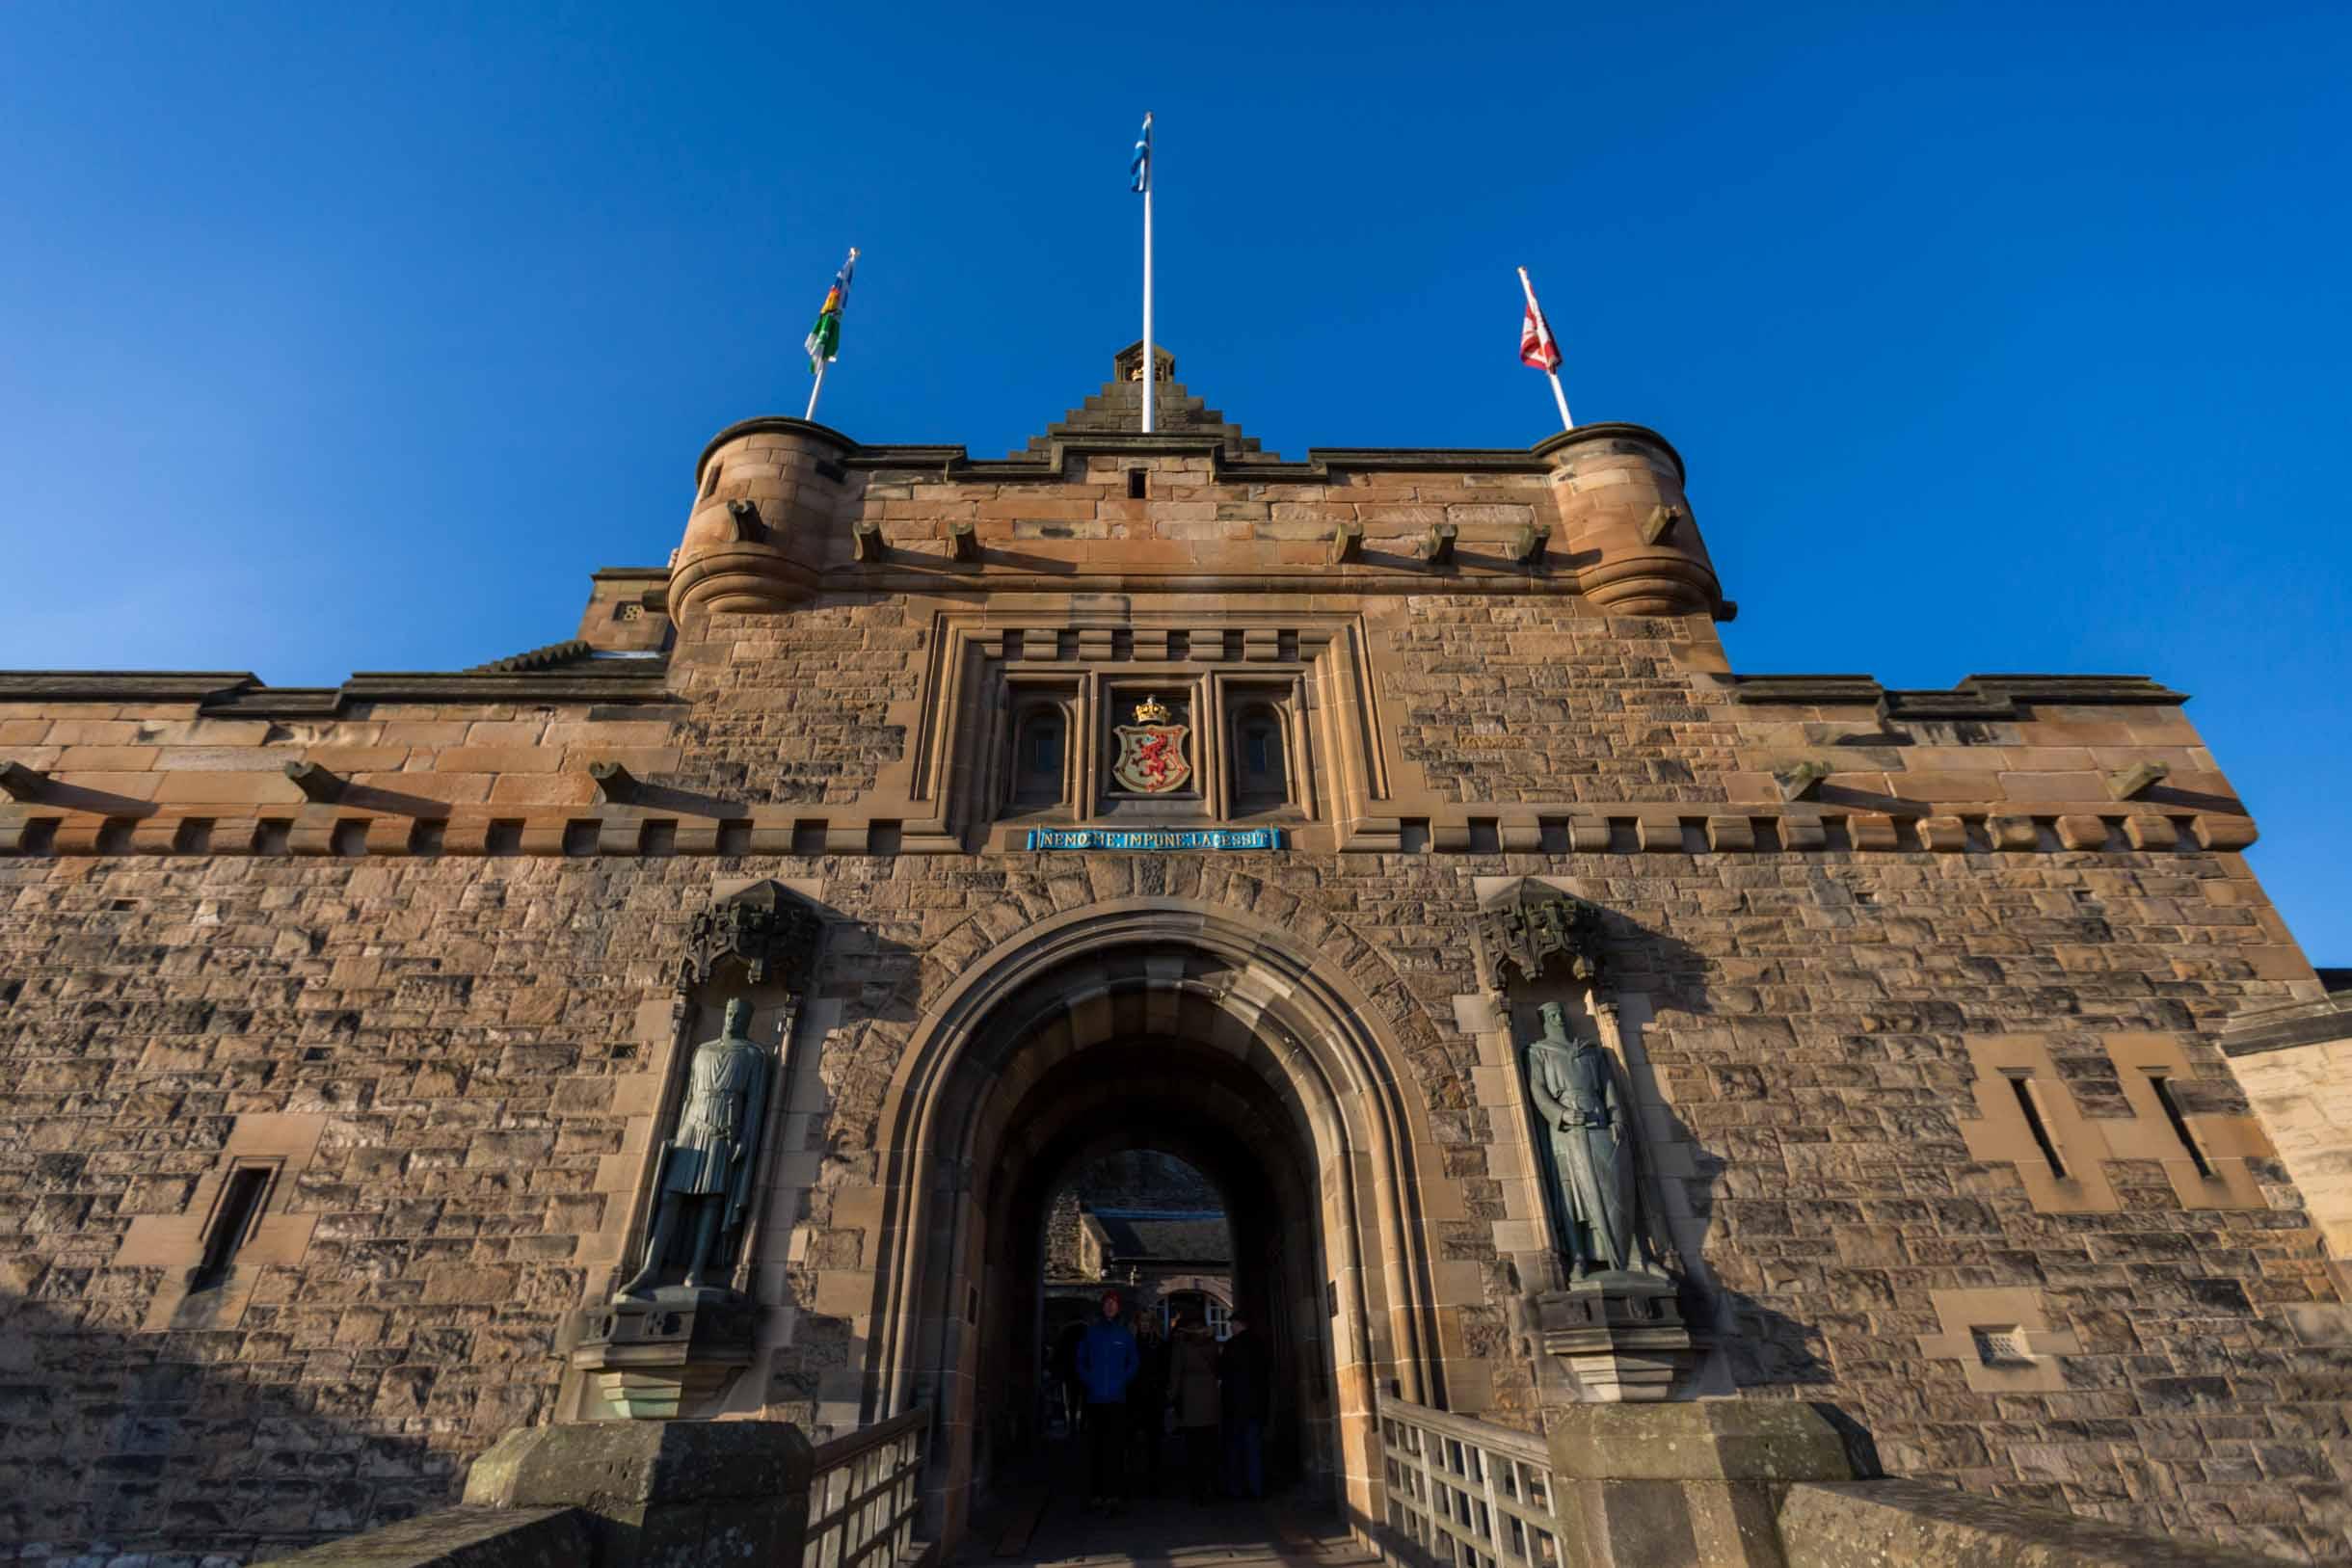 Picture Taken While Exploring Edinburgh - edinburgh castle